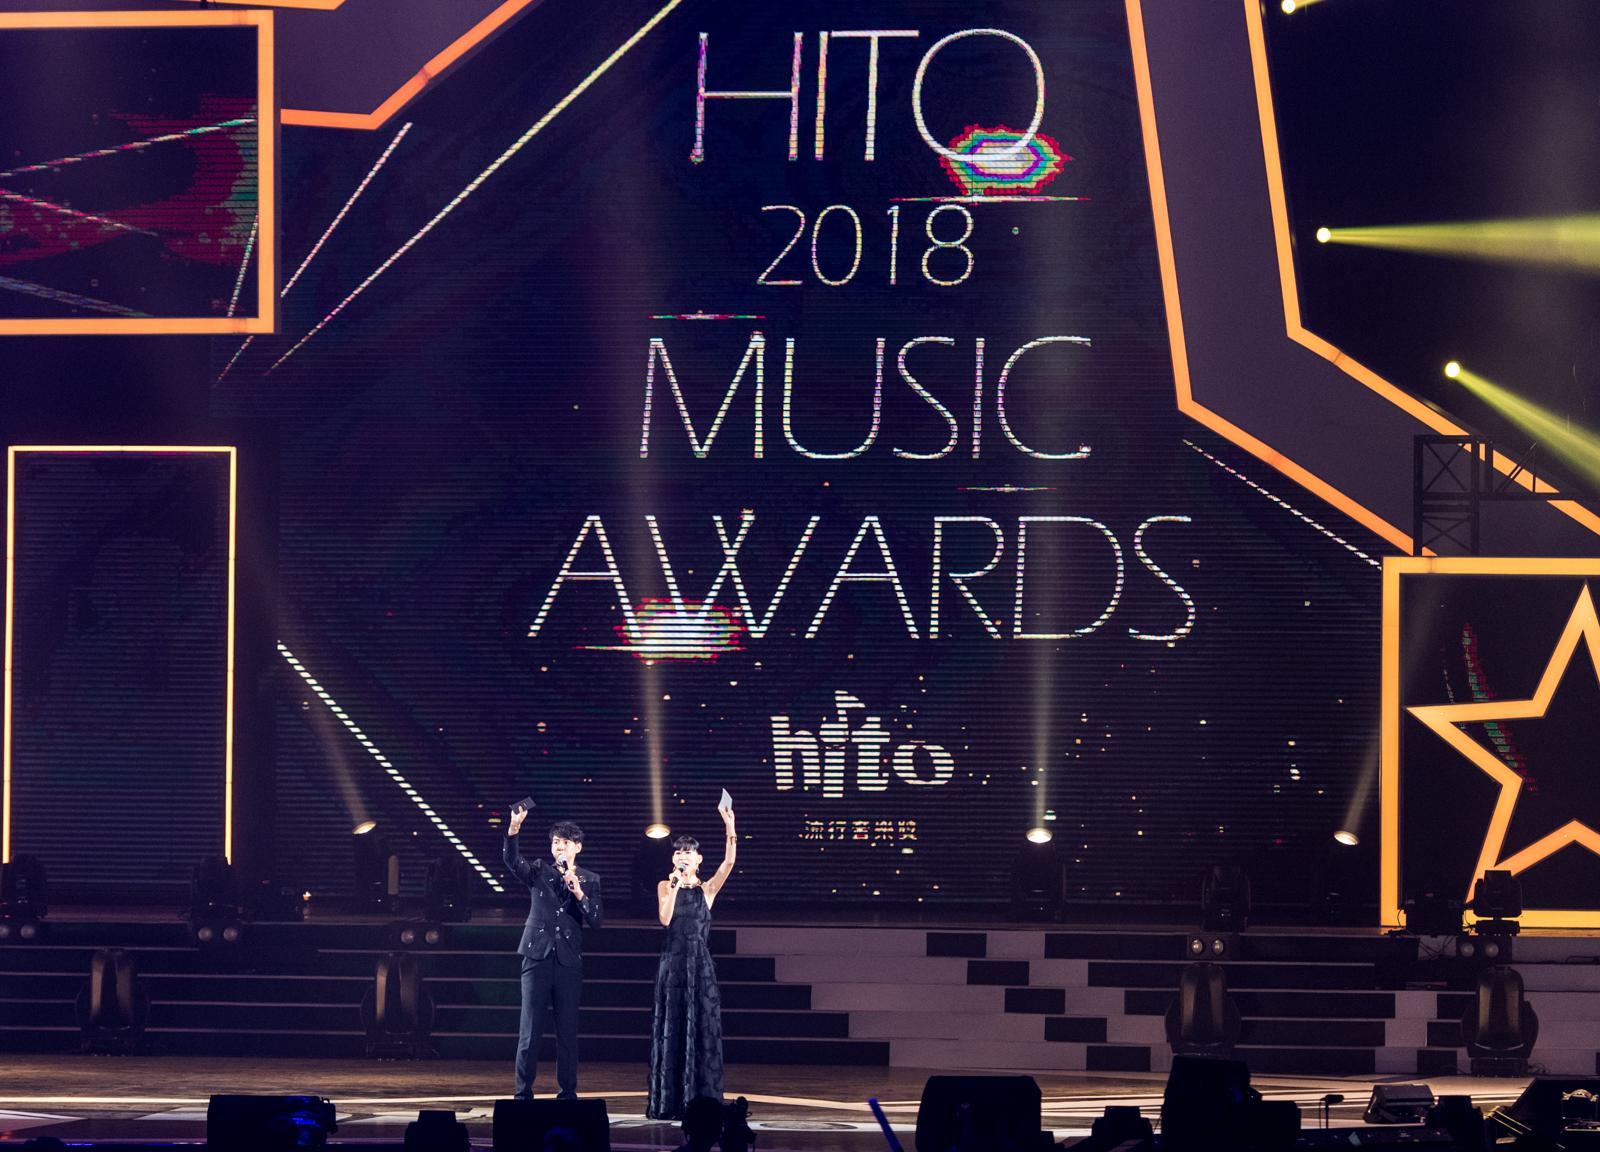 【圖輯】2018 hito 流行音樂獎頒獎典禮 | Capture@